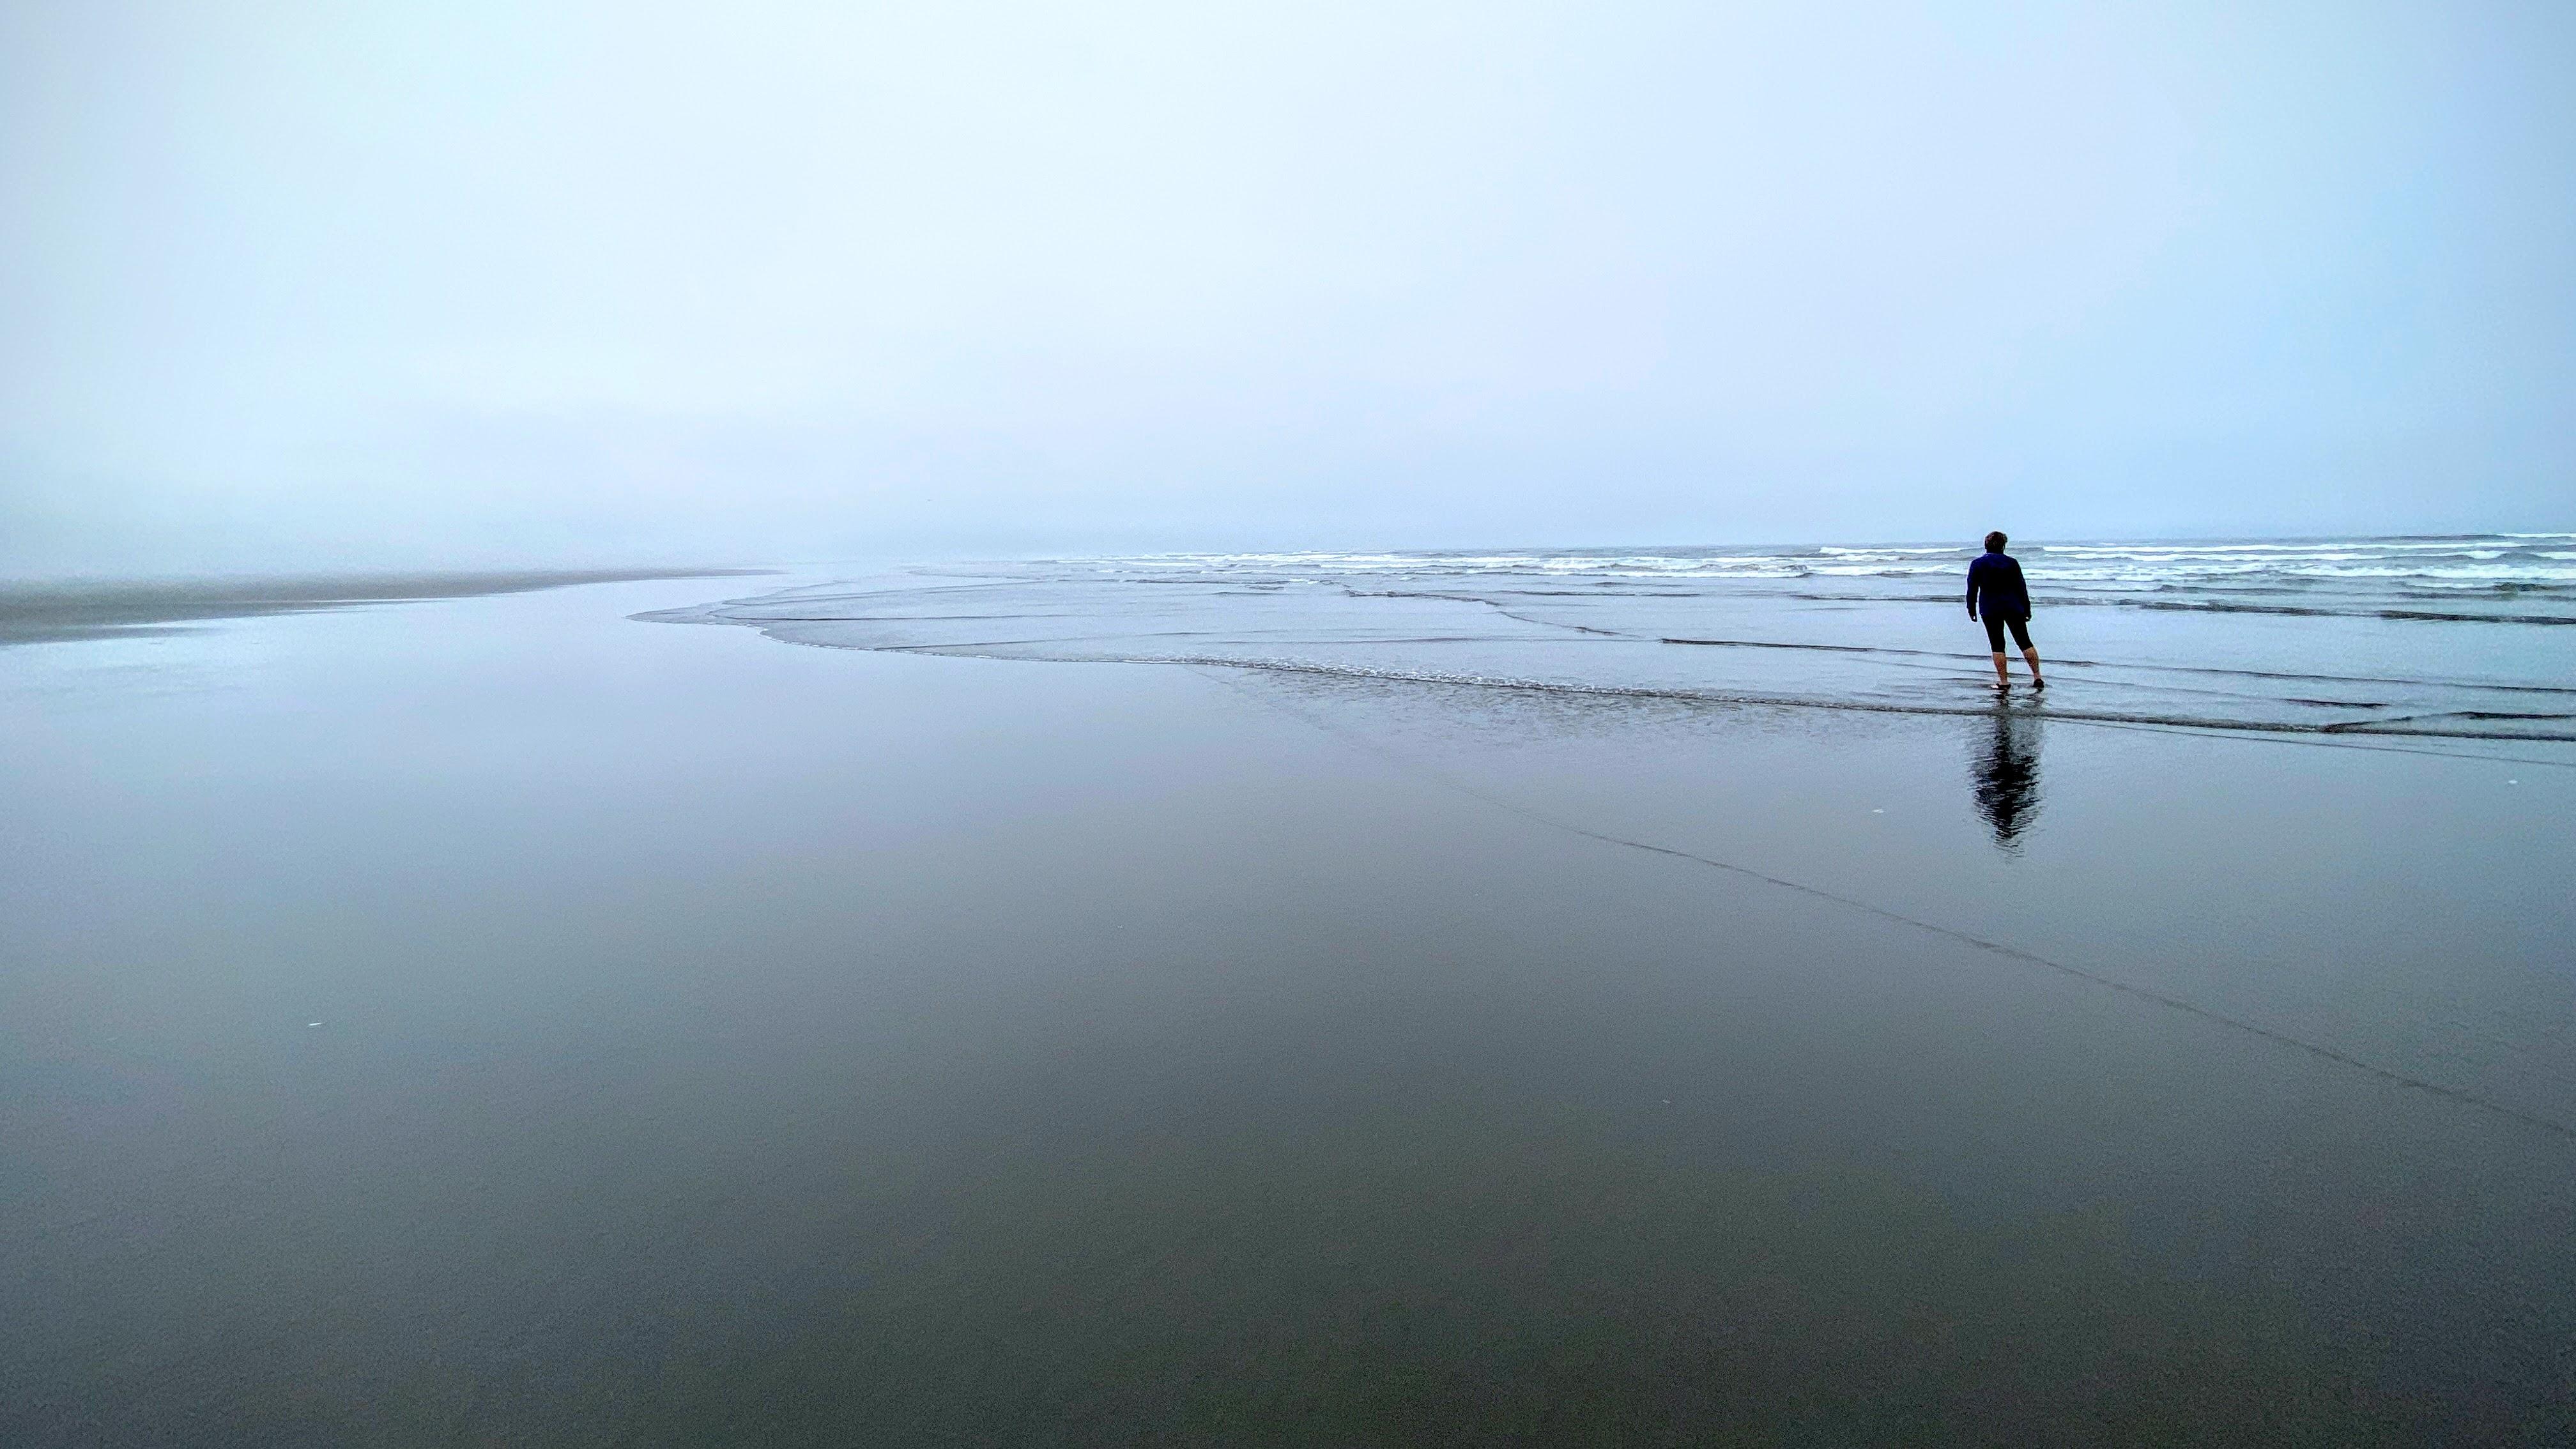 Postcard from Grayland Beach, Washington